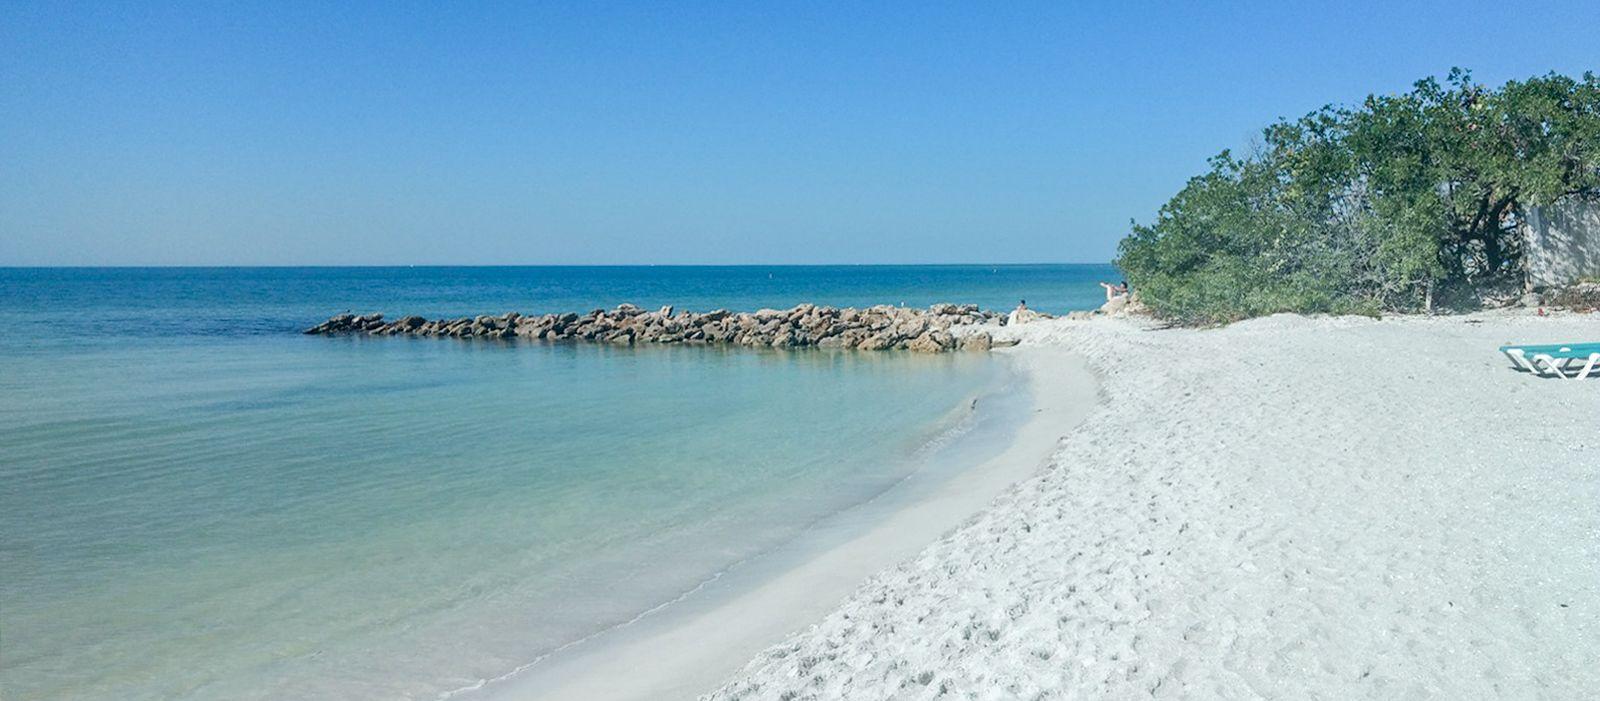 Lido Beach in Sarasota